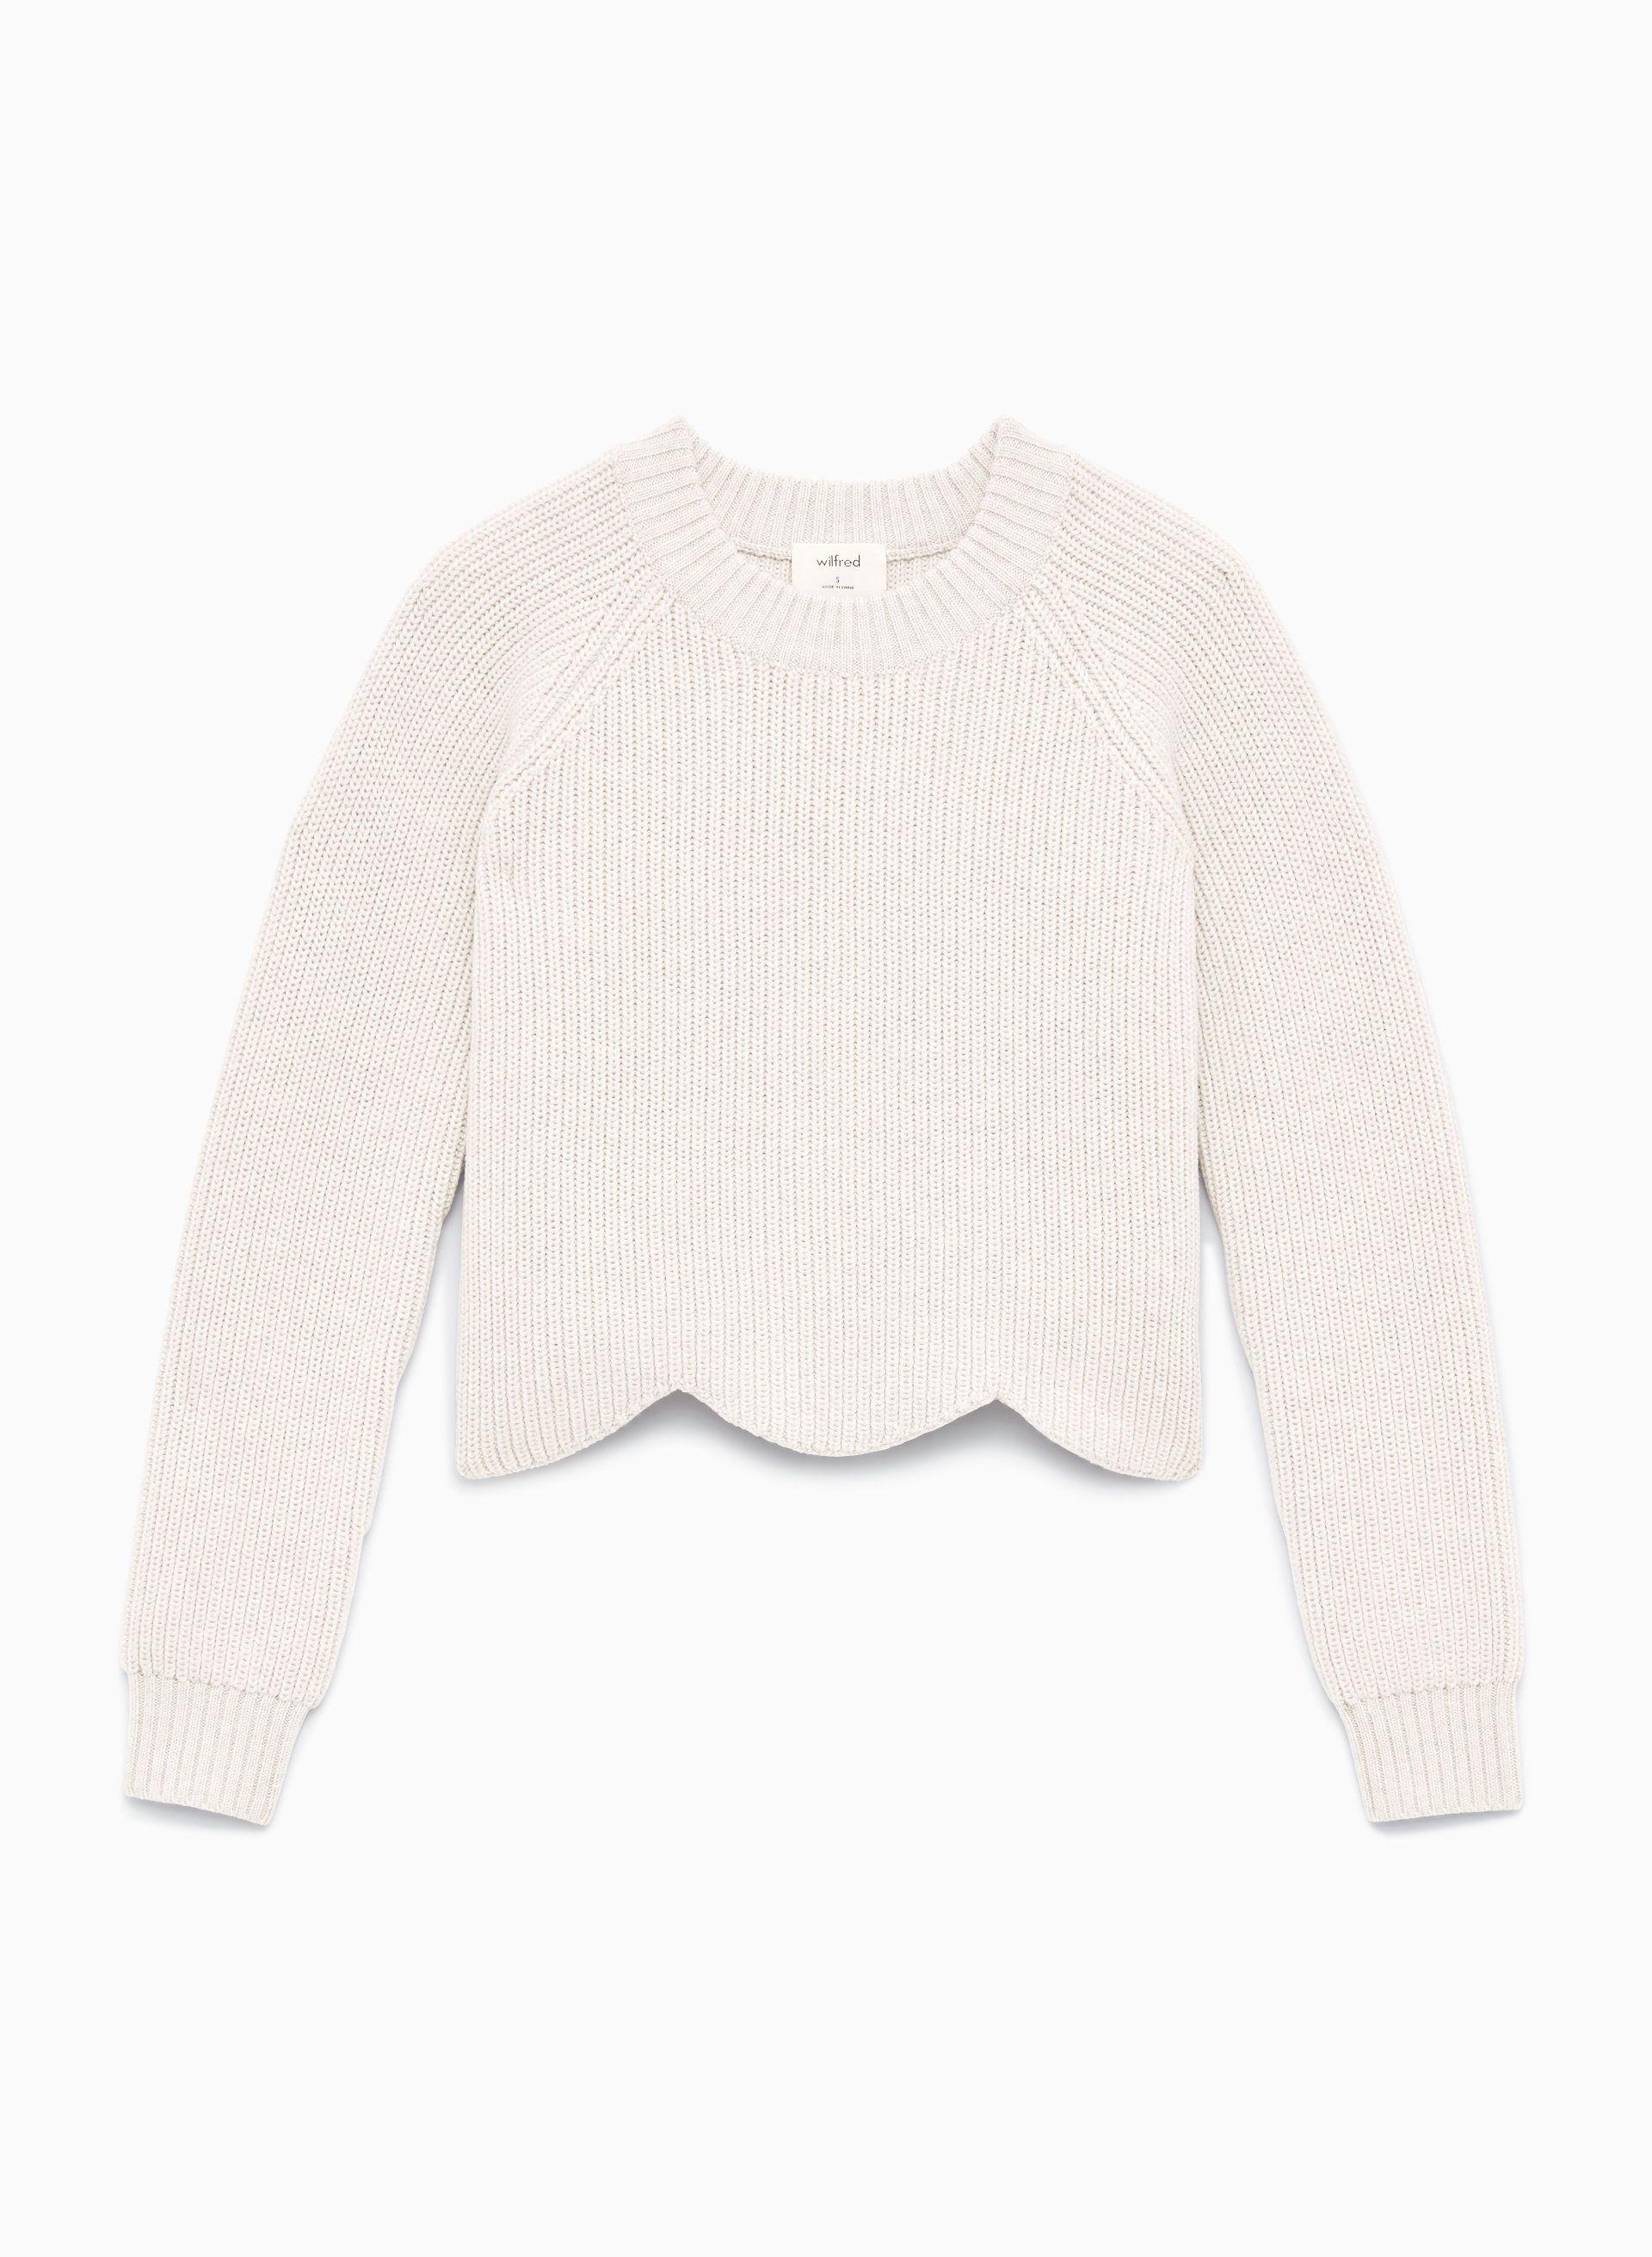 Wilfred SARDOU SWEATER   Aritzia   Sweaters, Scallop sweater